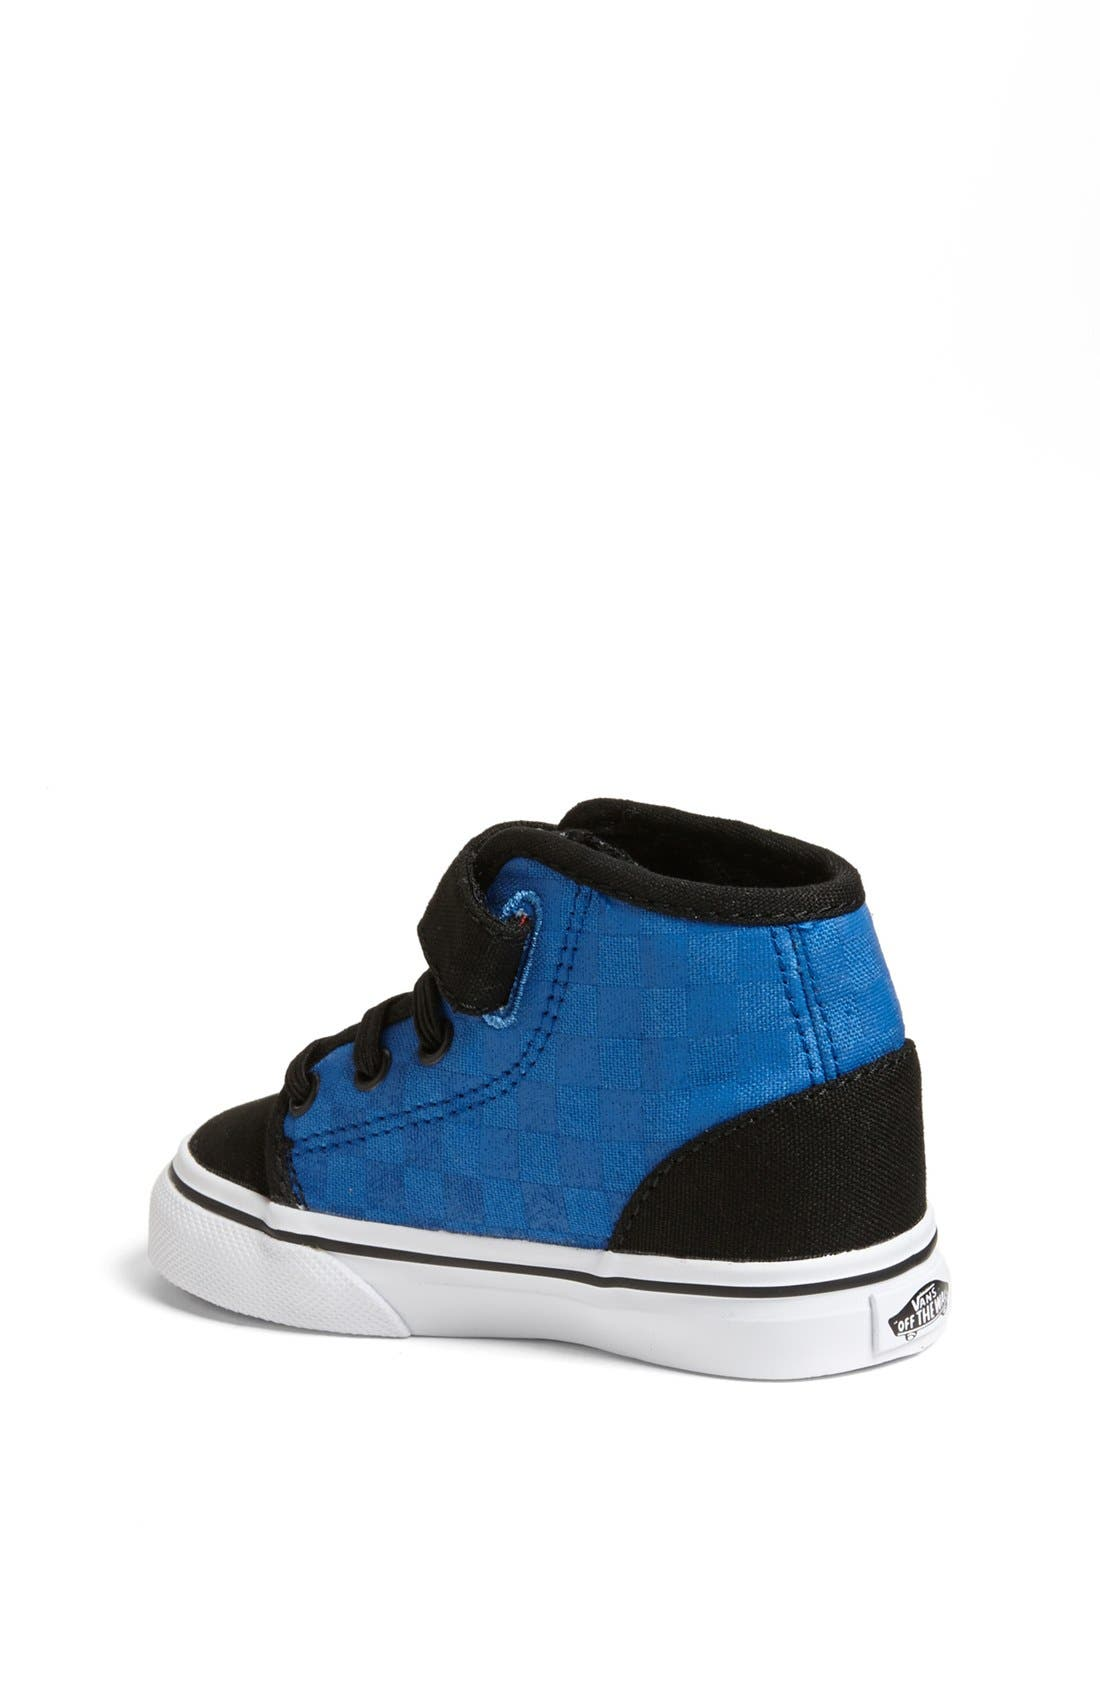 Alternate Image 2  - Vans High Top Sneaker (Baby, Walker & Toddler)